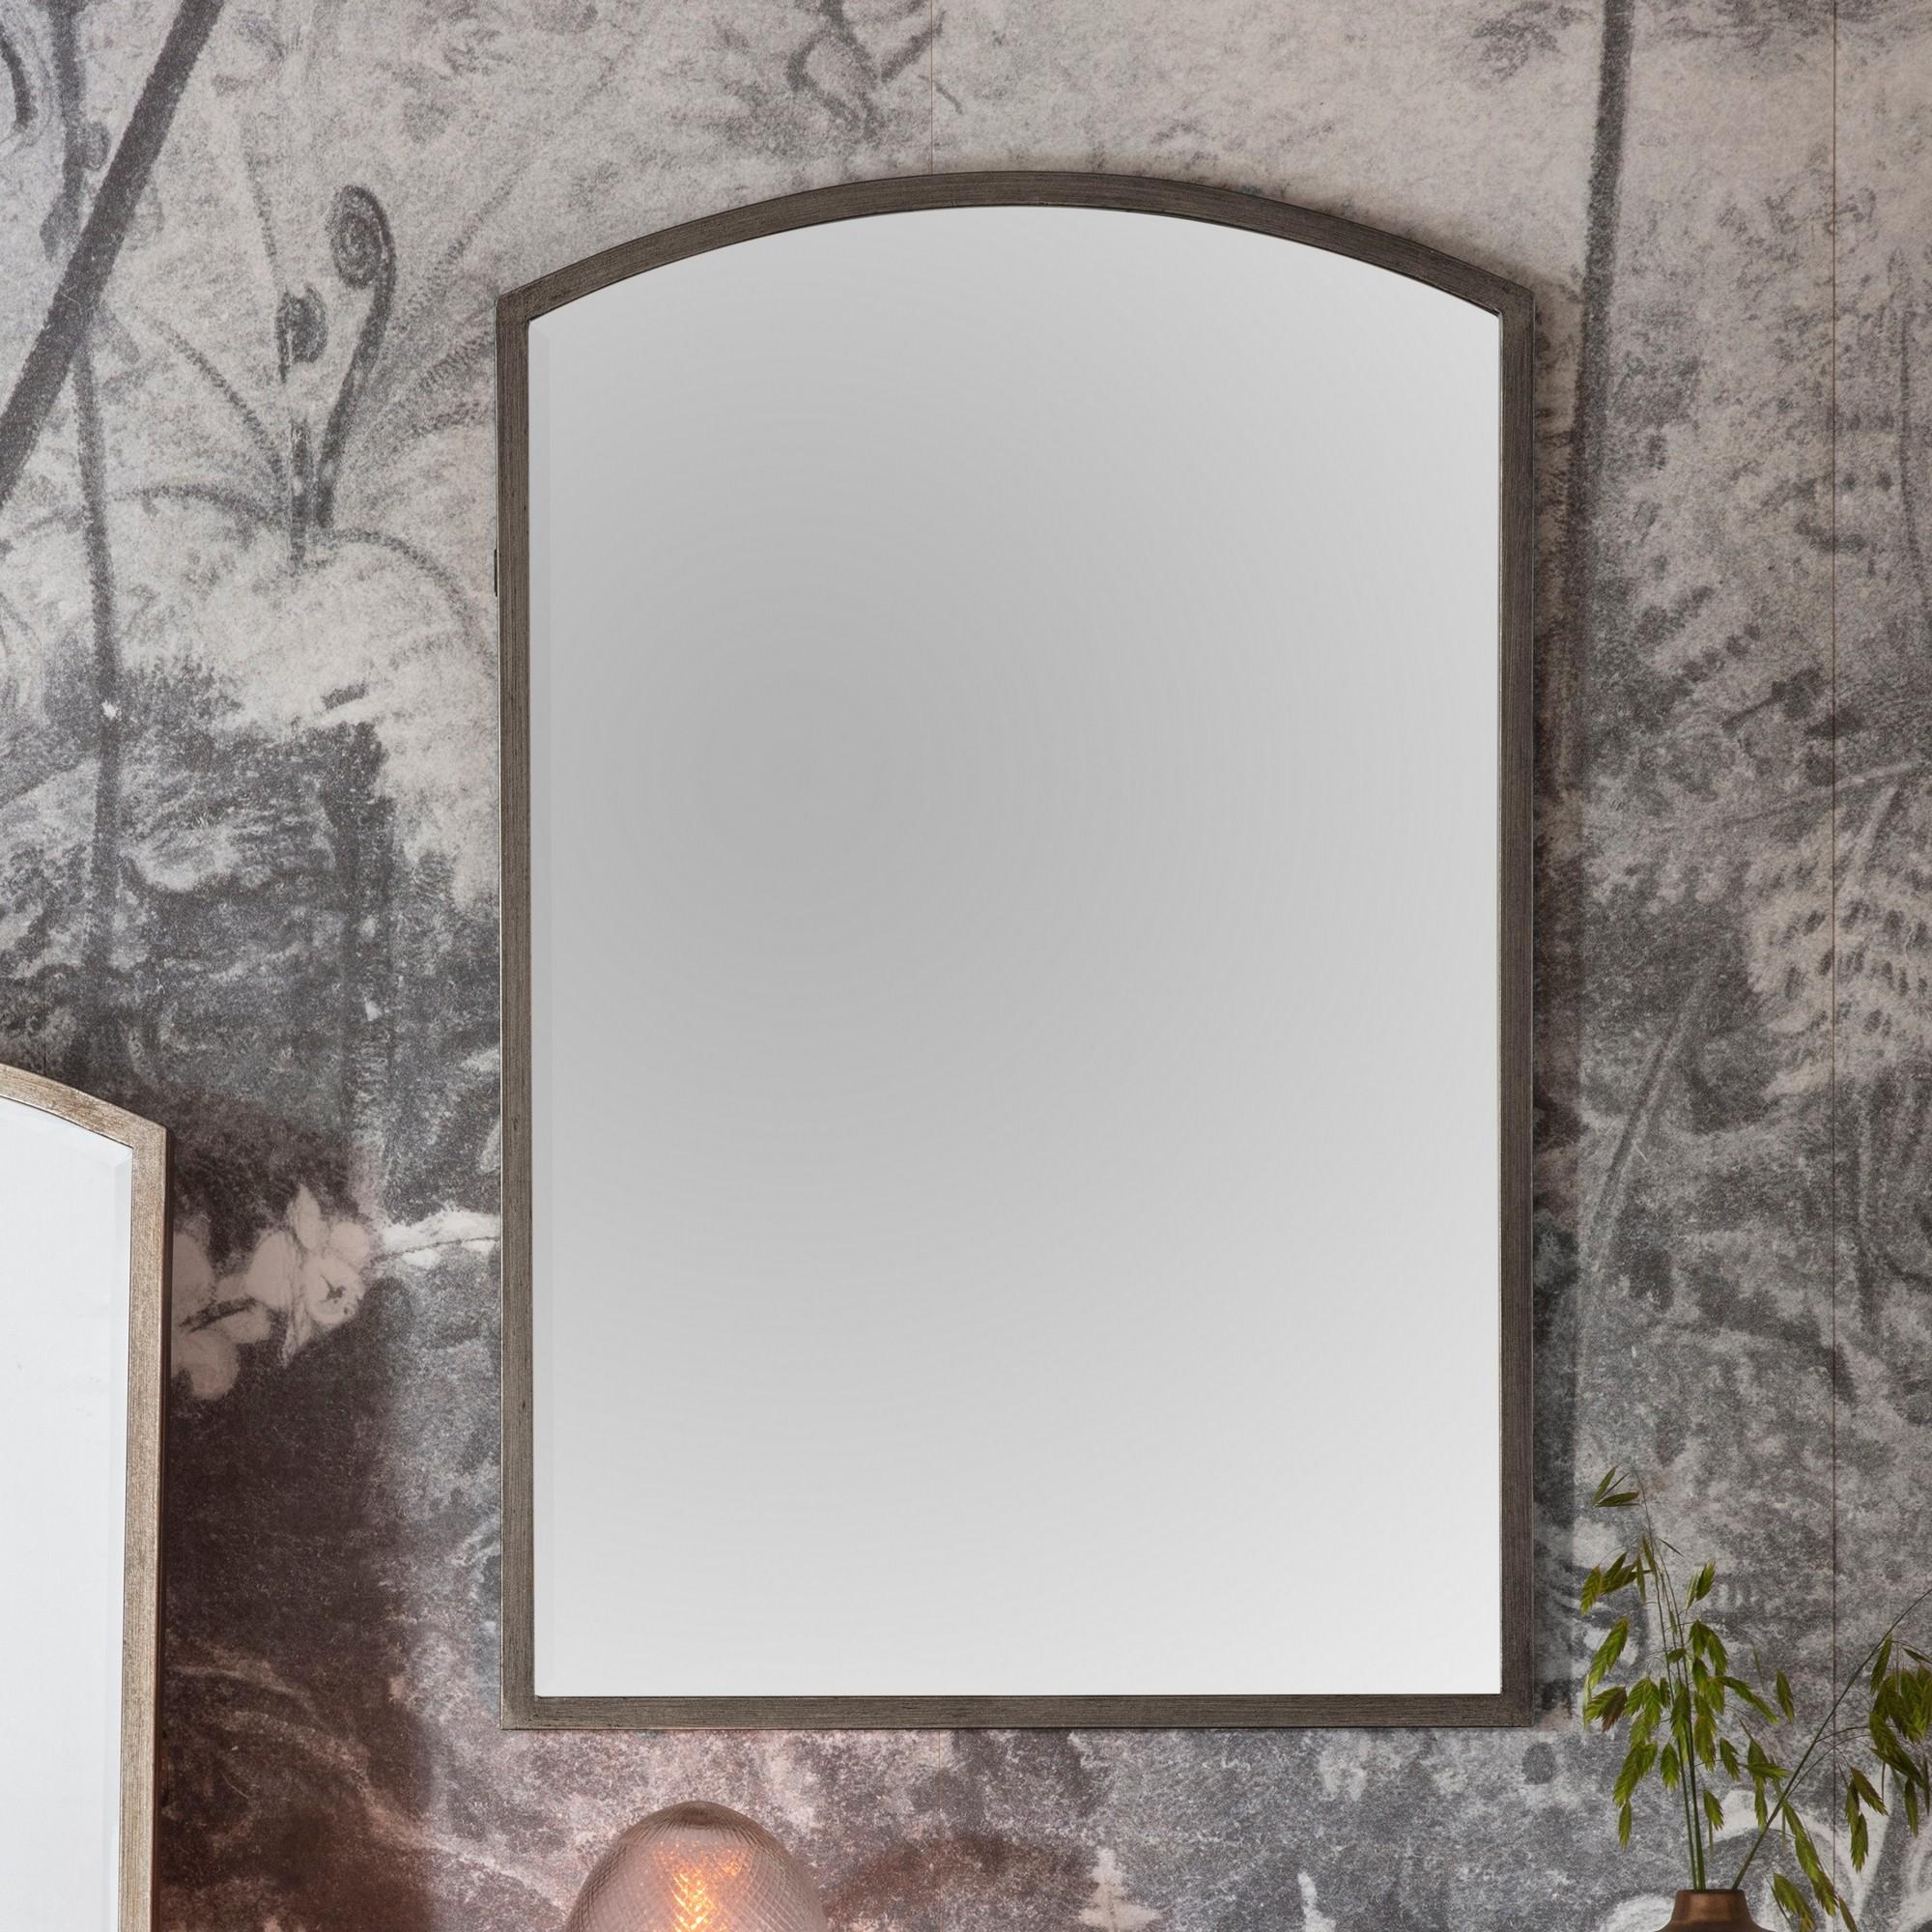 Hamill Metal Frame Arch Wall Mirror, 90cm, Antique Silver